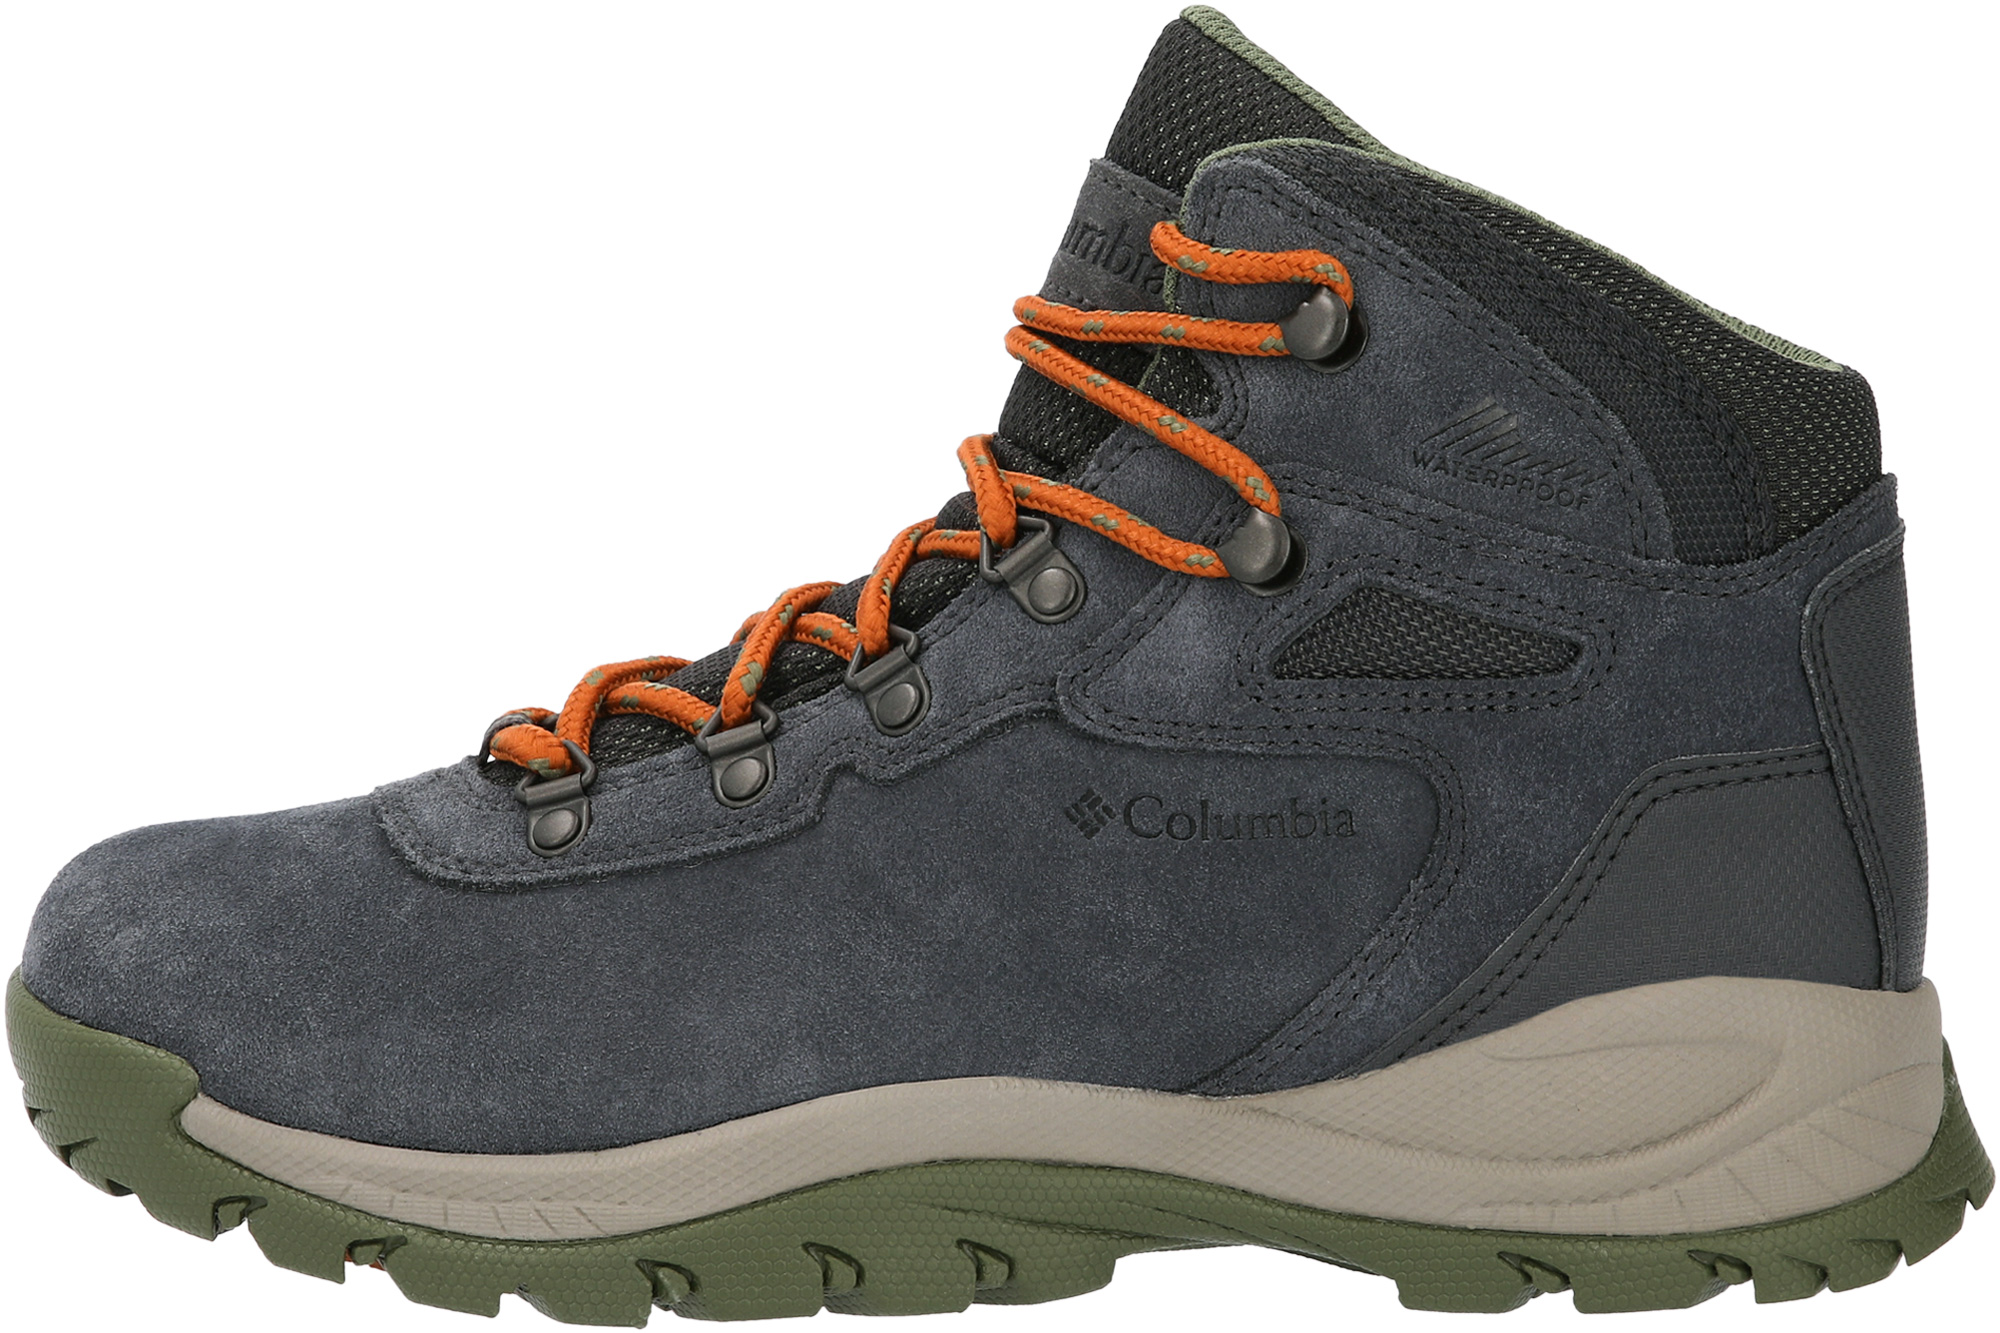 Фото - Columbia Ботинки женские Columbia Newton Ridge™ Plus Waterproof Amped, размер 40 columbia ботинки для мальчиков columbia youth newton ridge размер 37 5